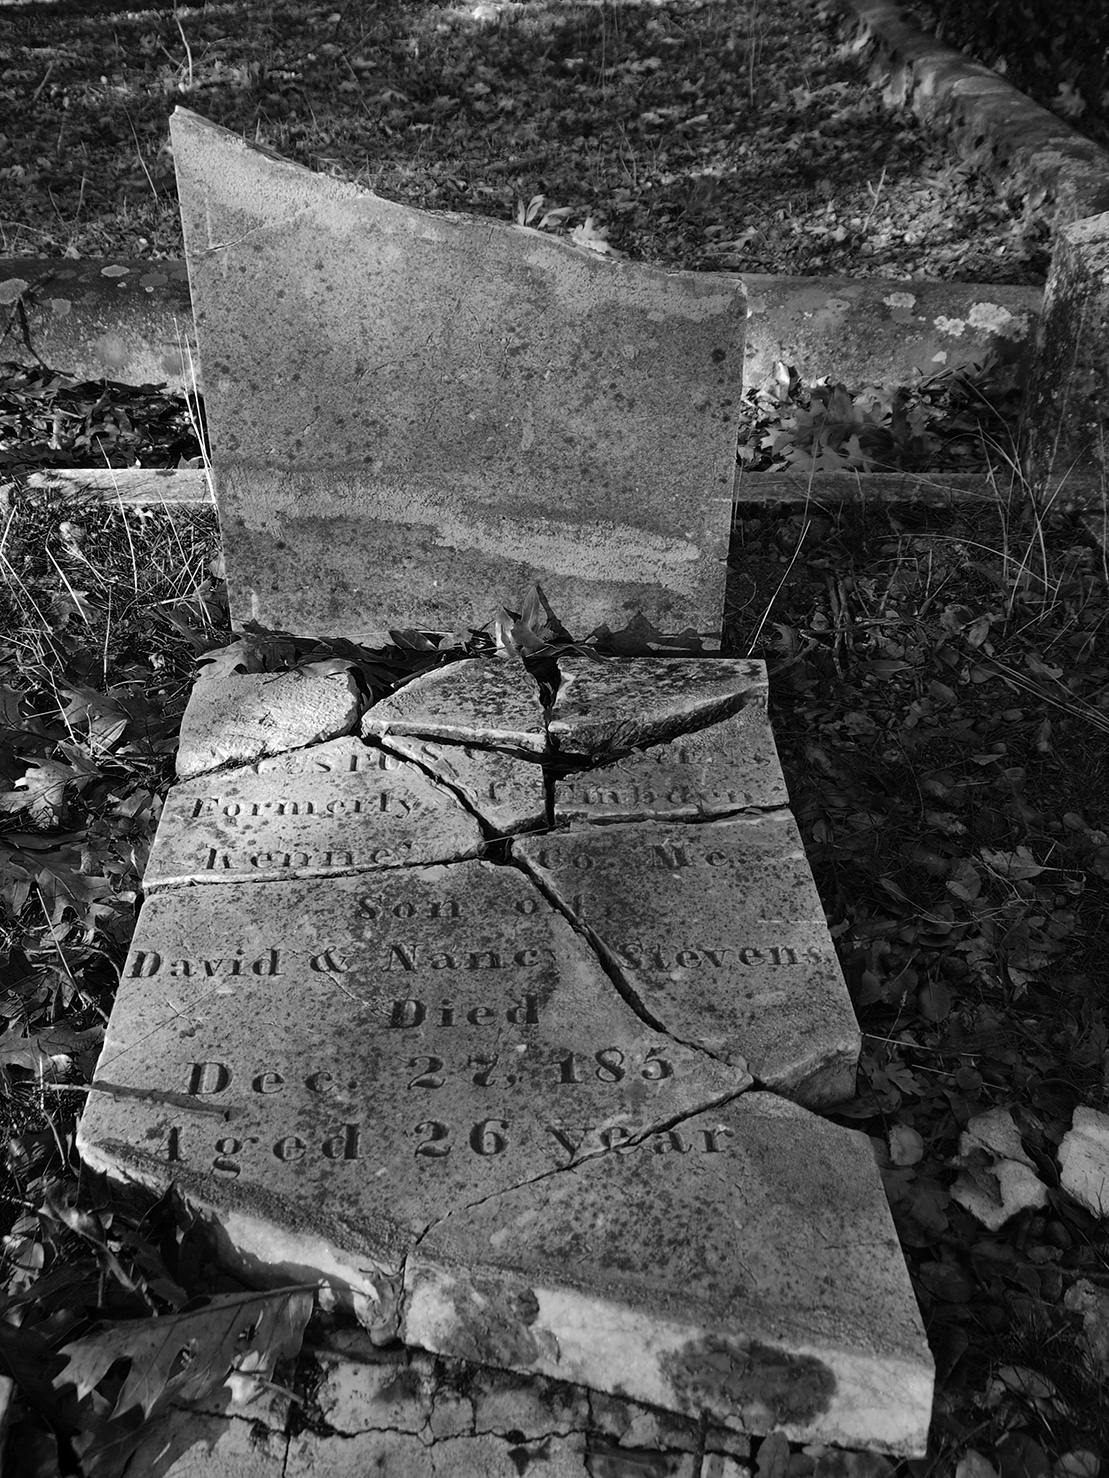 Columbia Cemetery Broken Stone 1850s.jpg